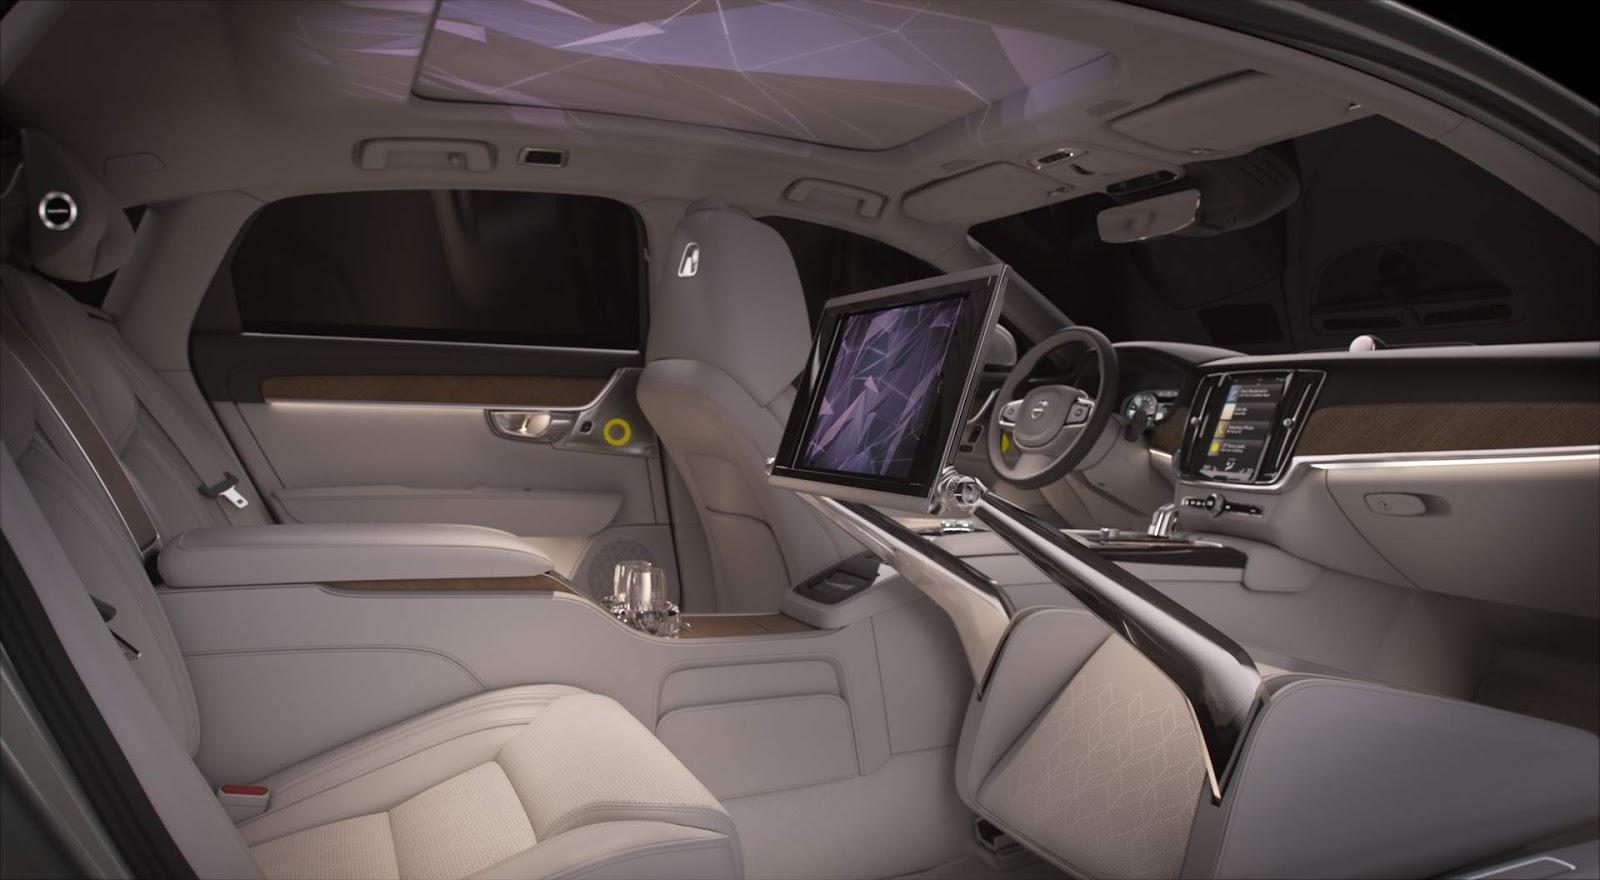 volvo s90 ambience conceito de alto luxo revelado china car blog br. Black Bedroom Furniture Sets. Home Design Ideas